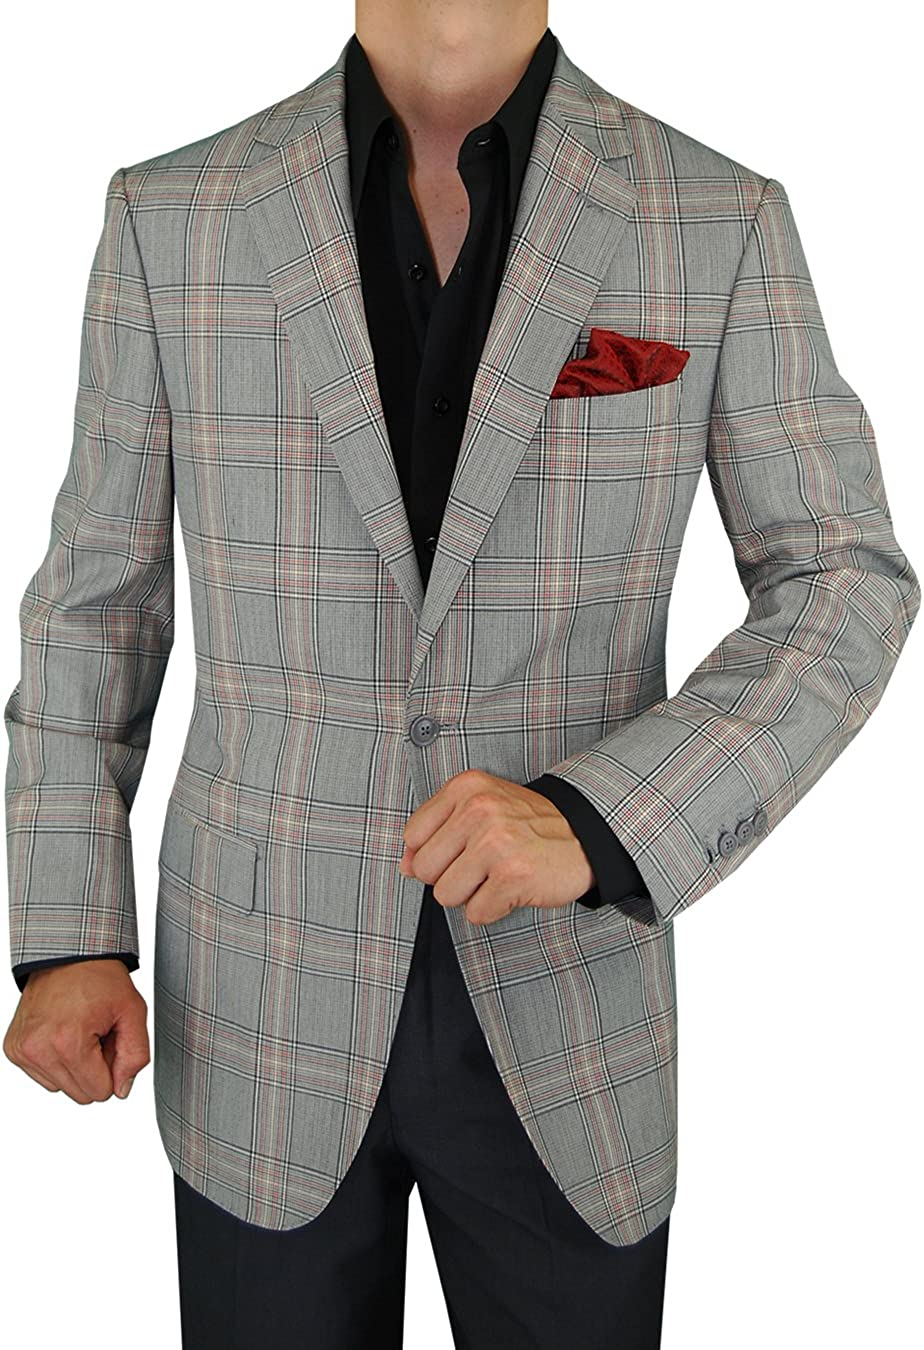 DTI GV Executive Men's Italian Wool Suit Jacket Modern Fit One Button Blazer